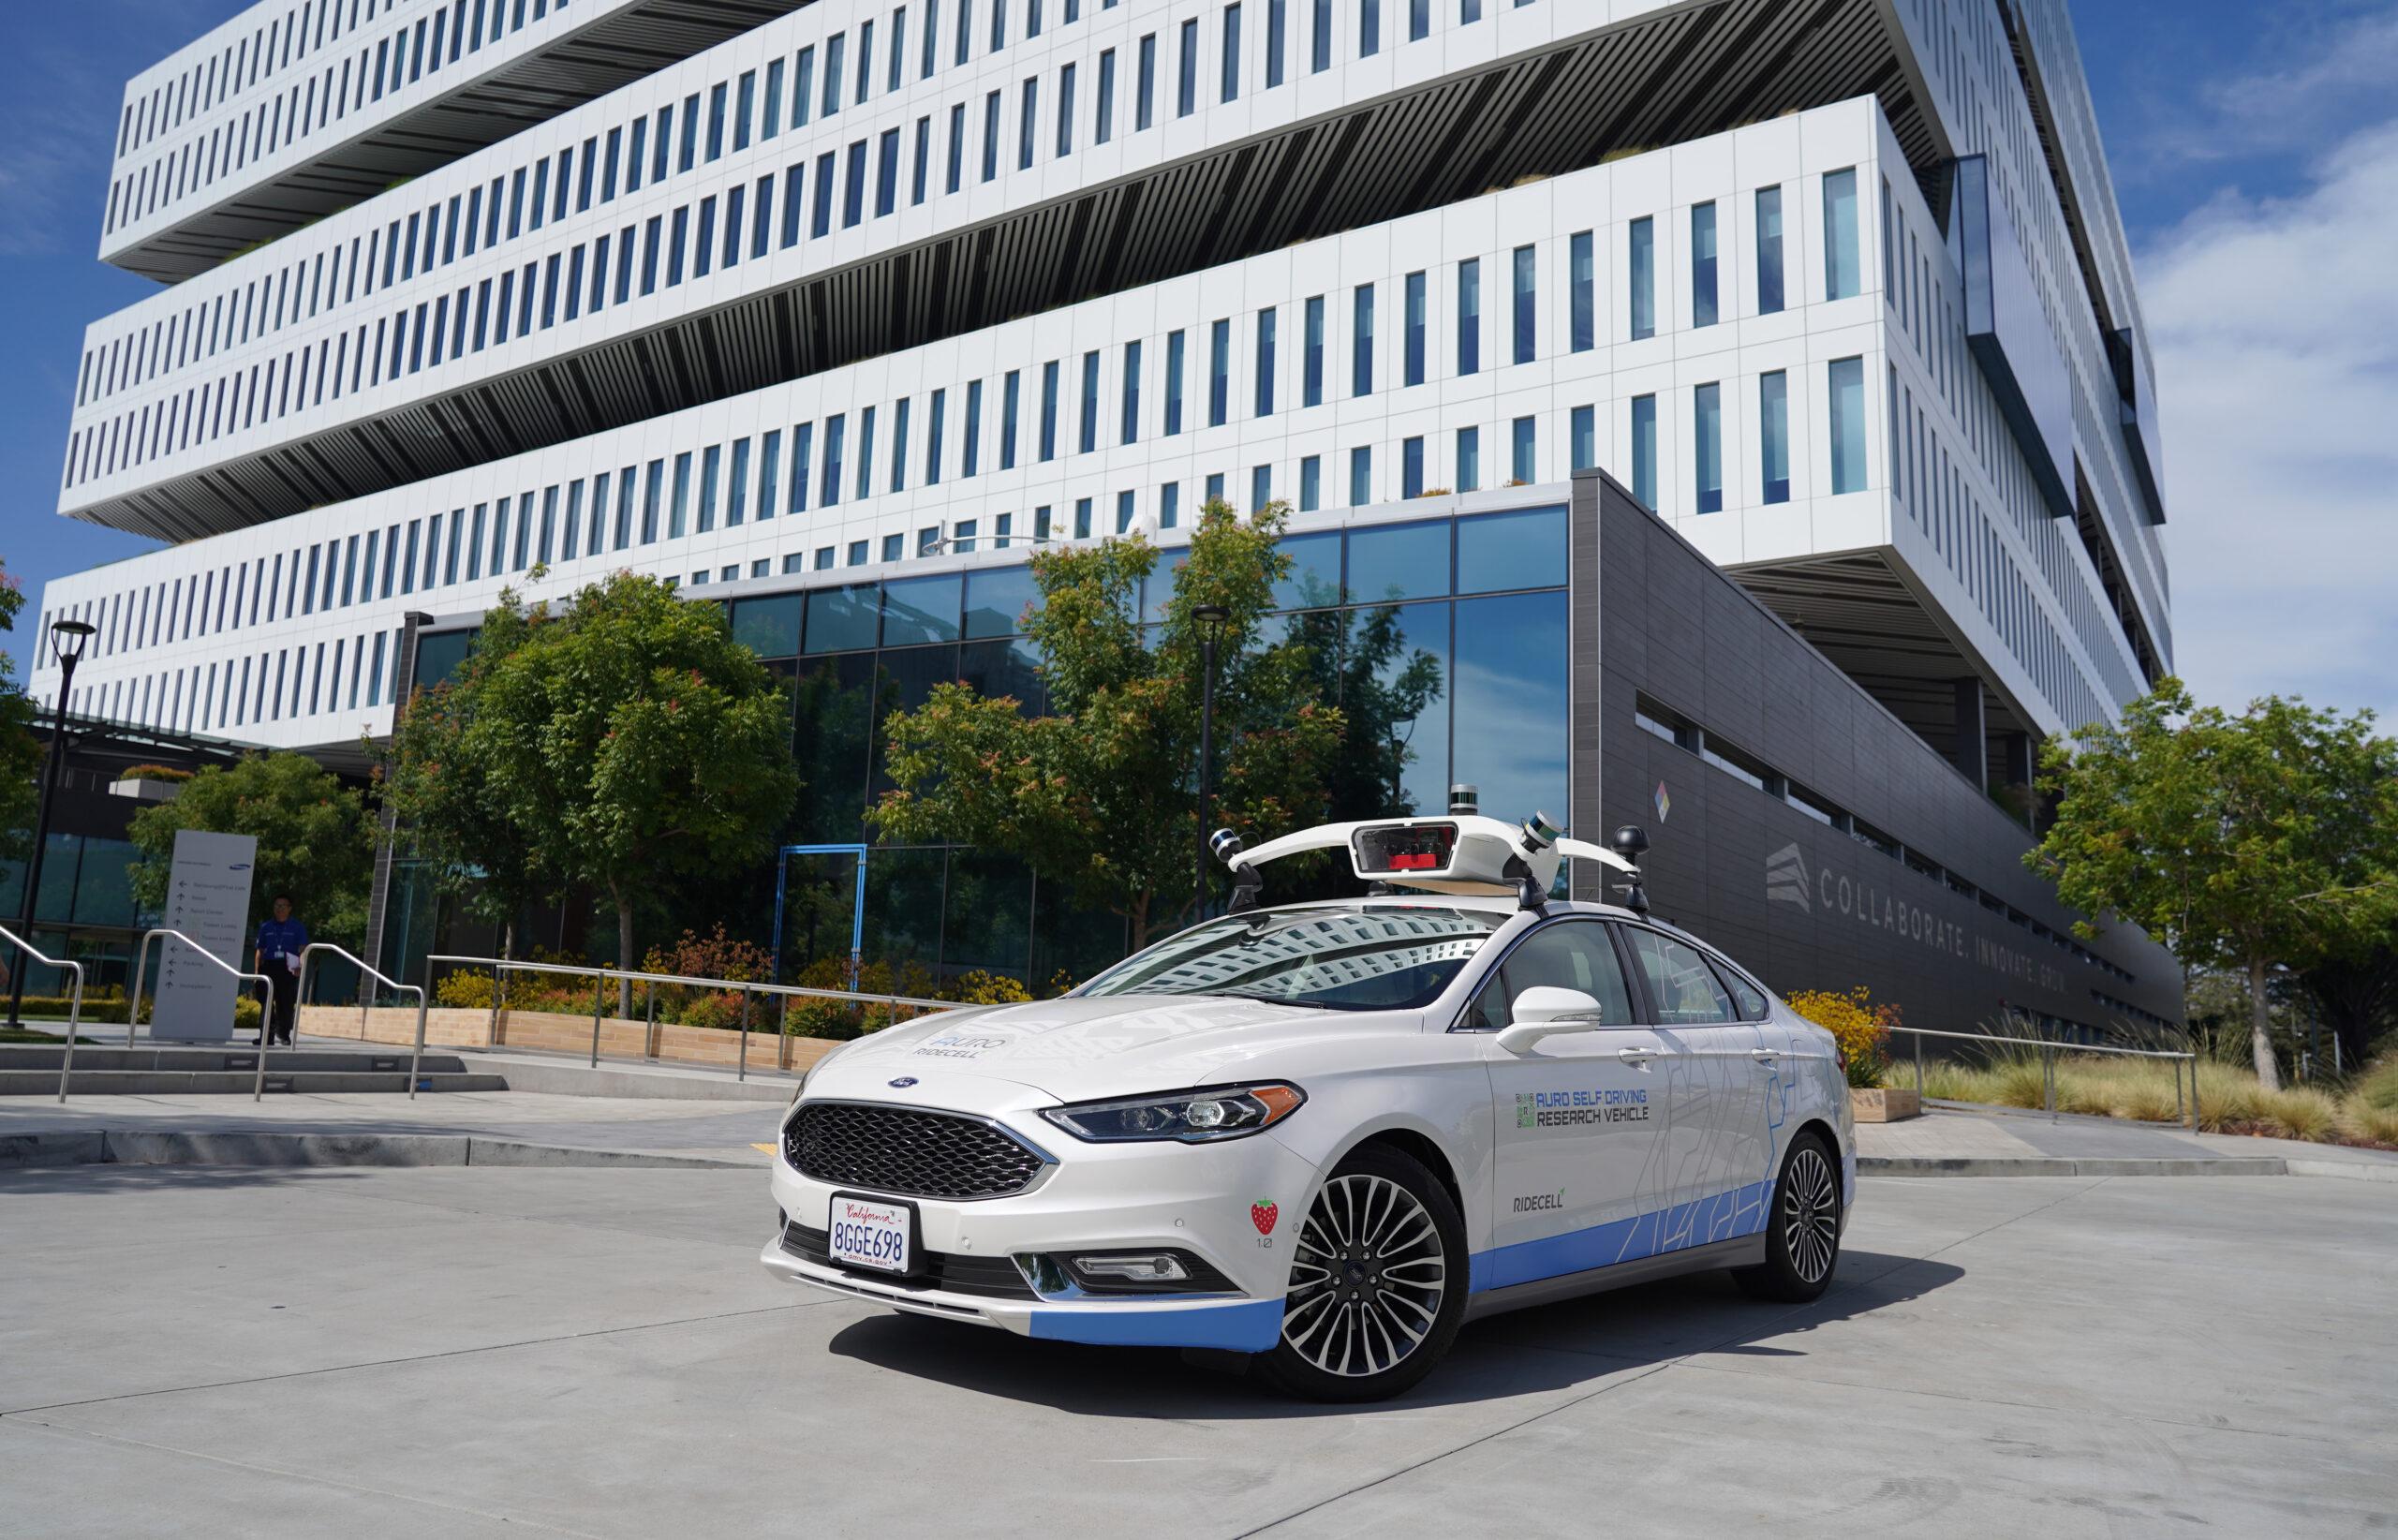 Ridecell Auro self-driving platform